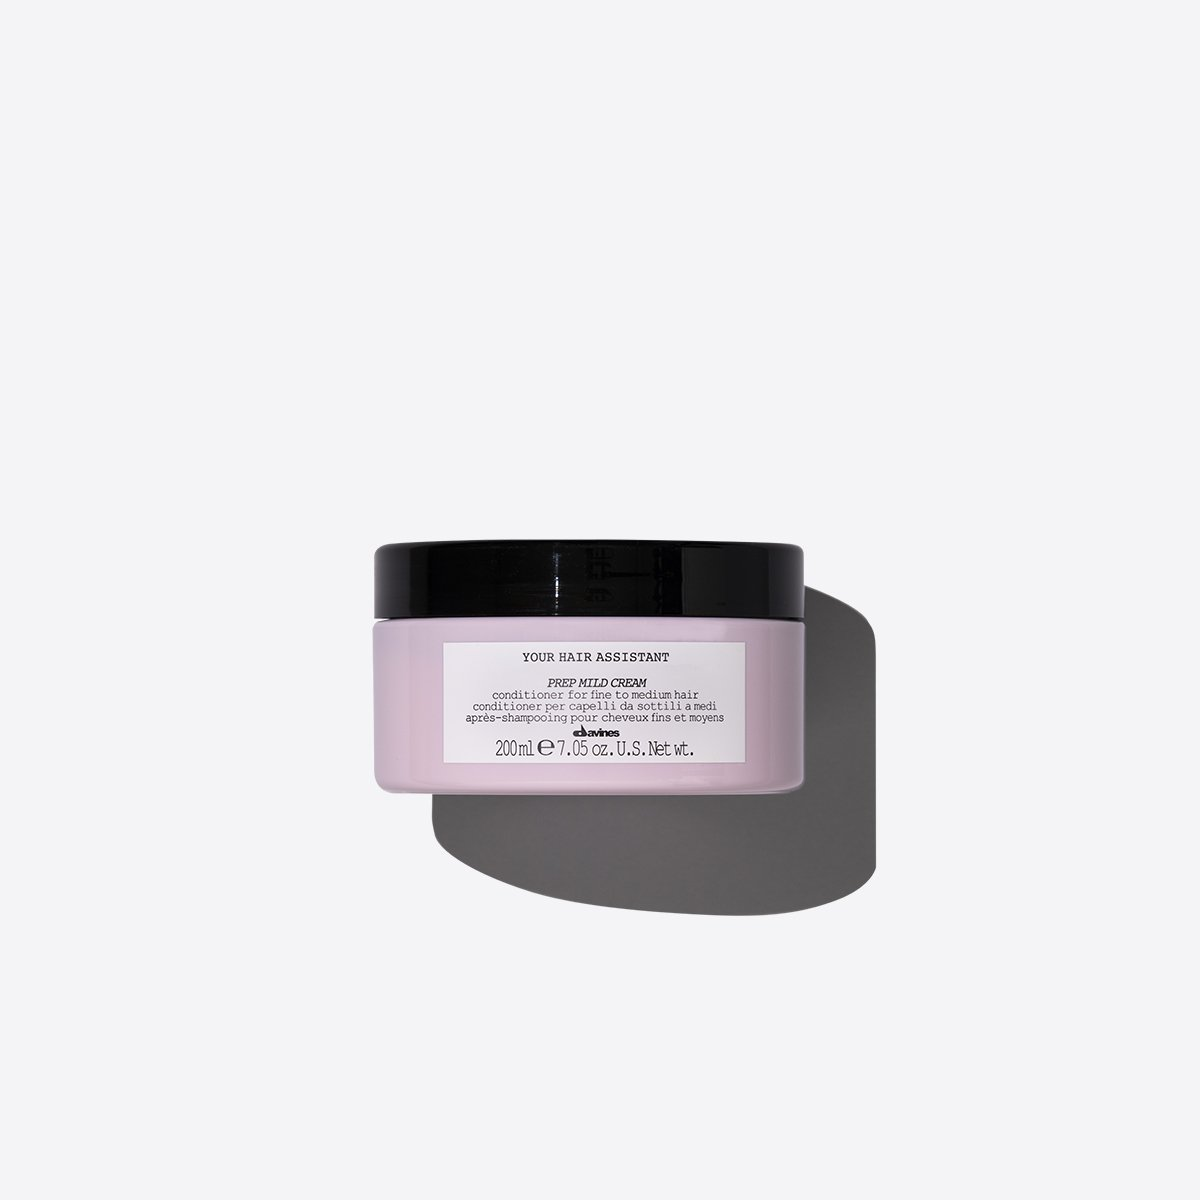 YOUR HAIR ASSISTANT Prep Mild Cream  250ml